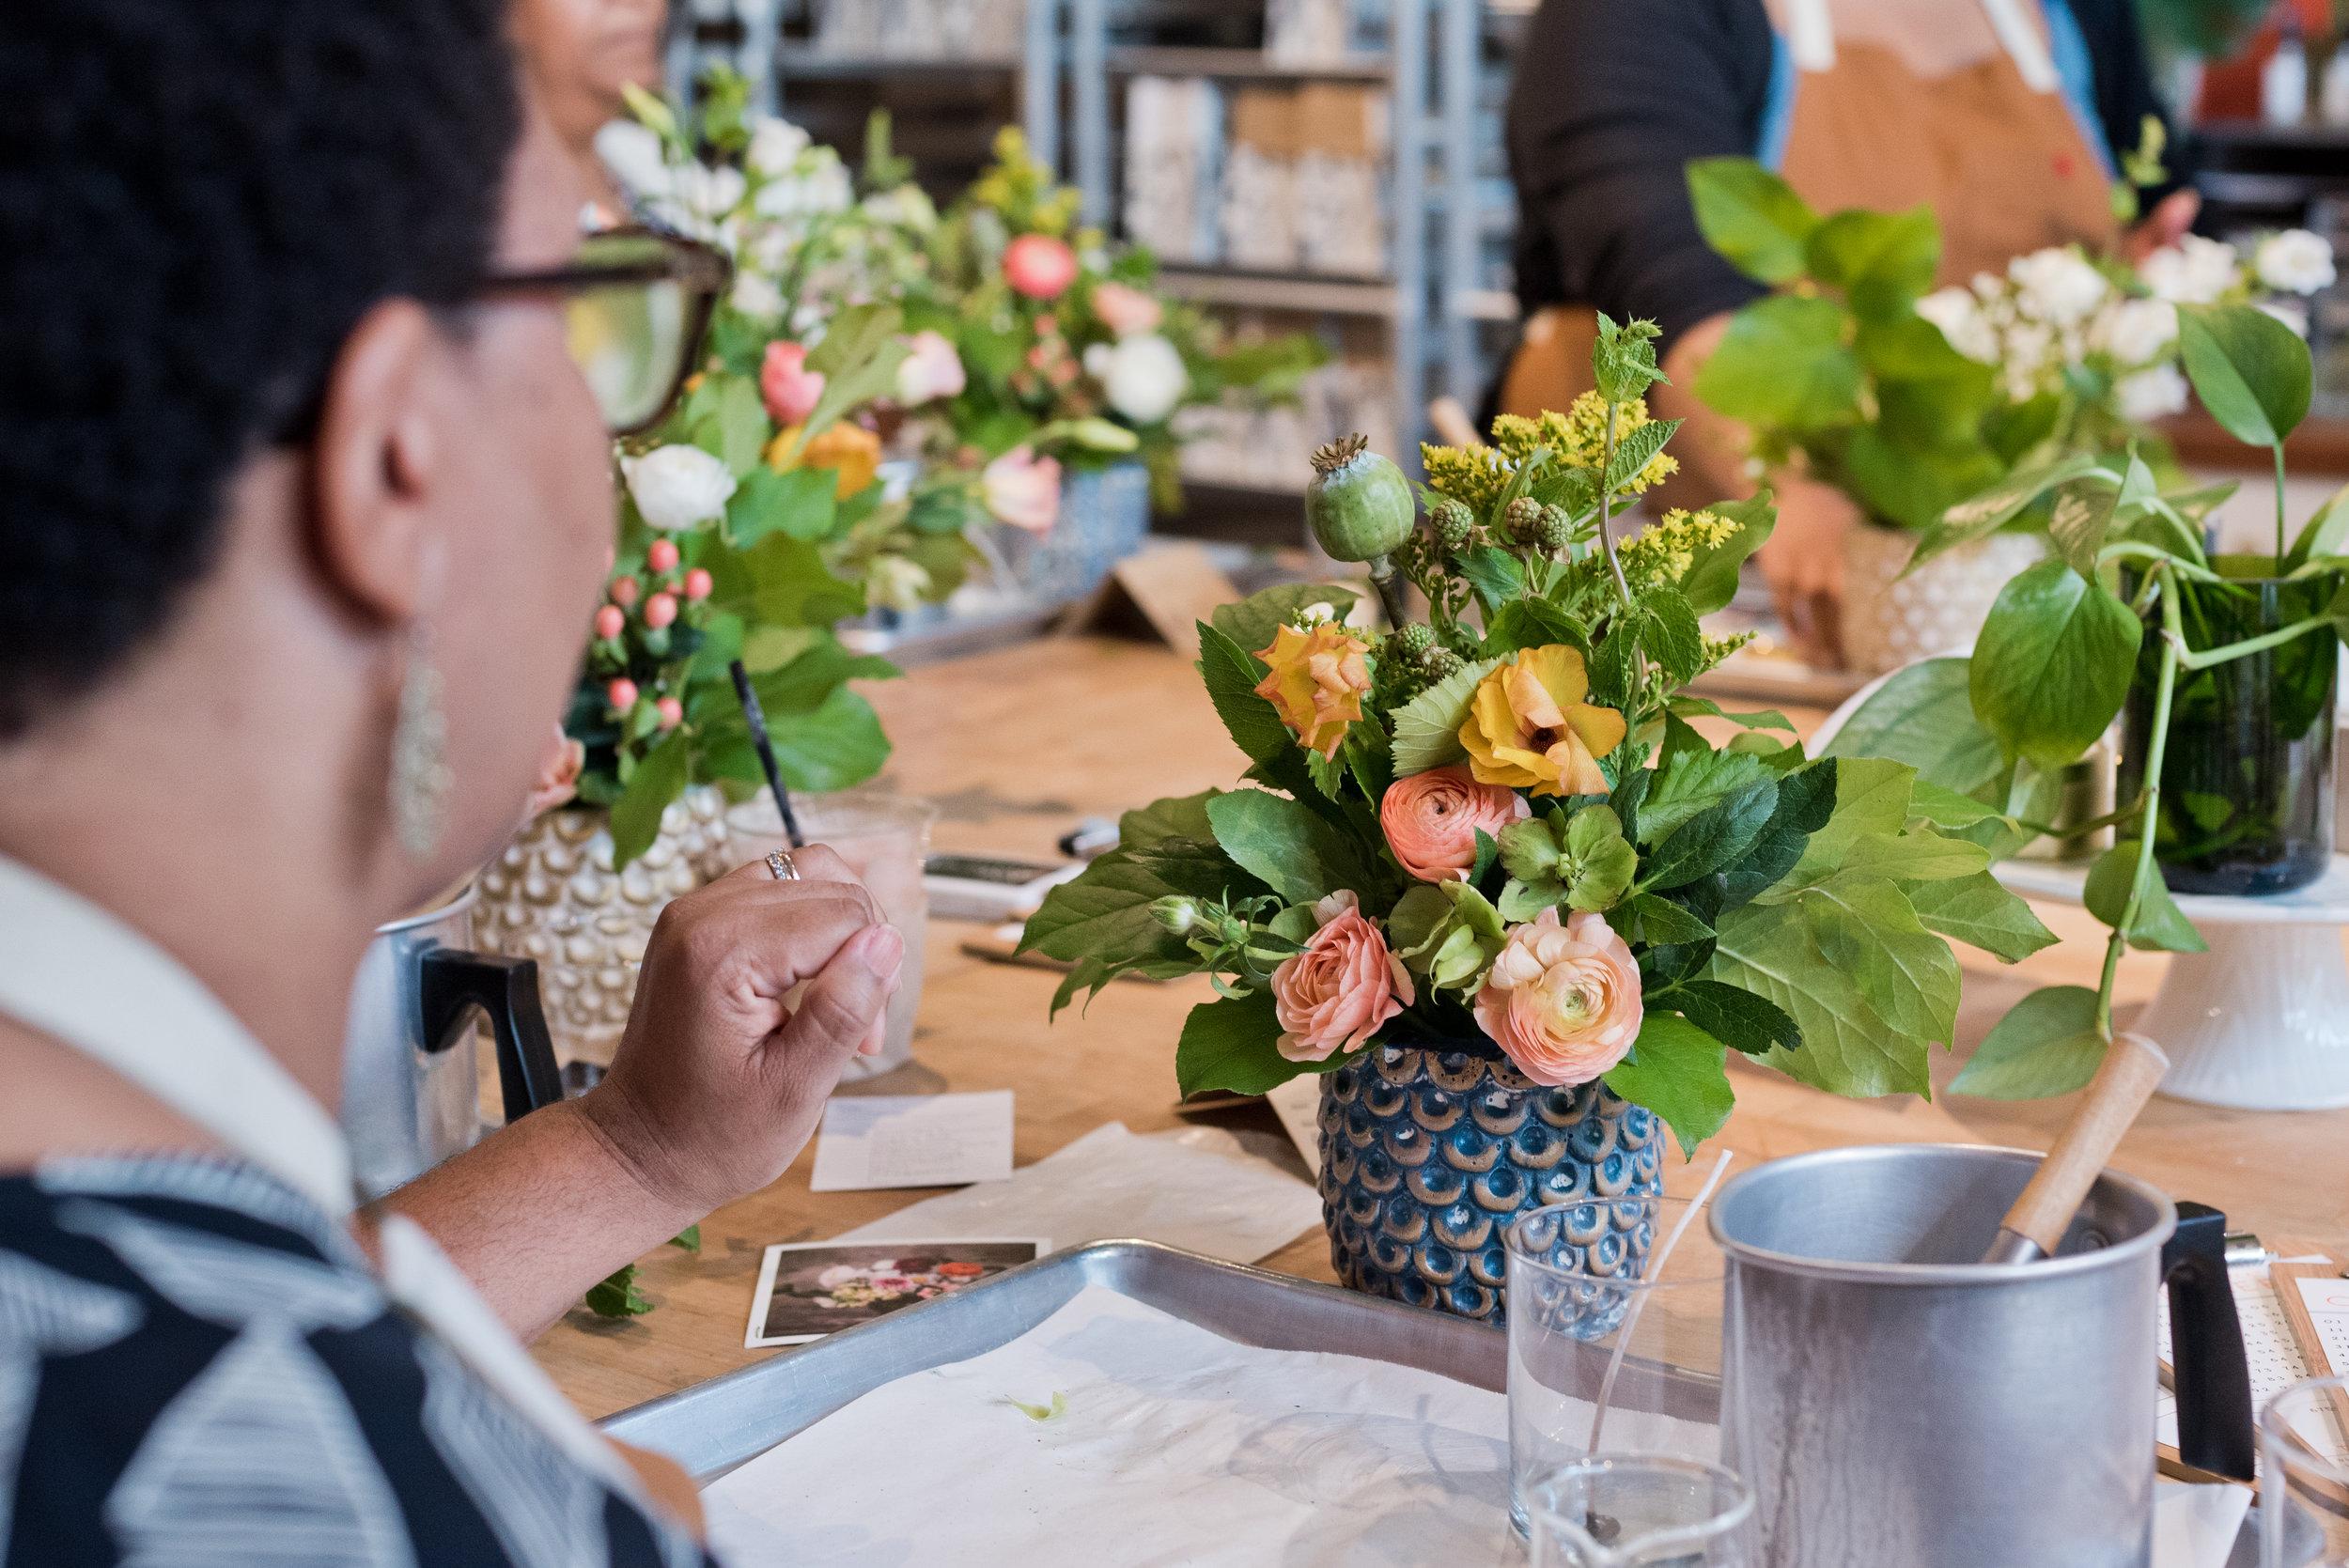 petal-and-fold-candlefish-workshop-july-2018-53.jpg